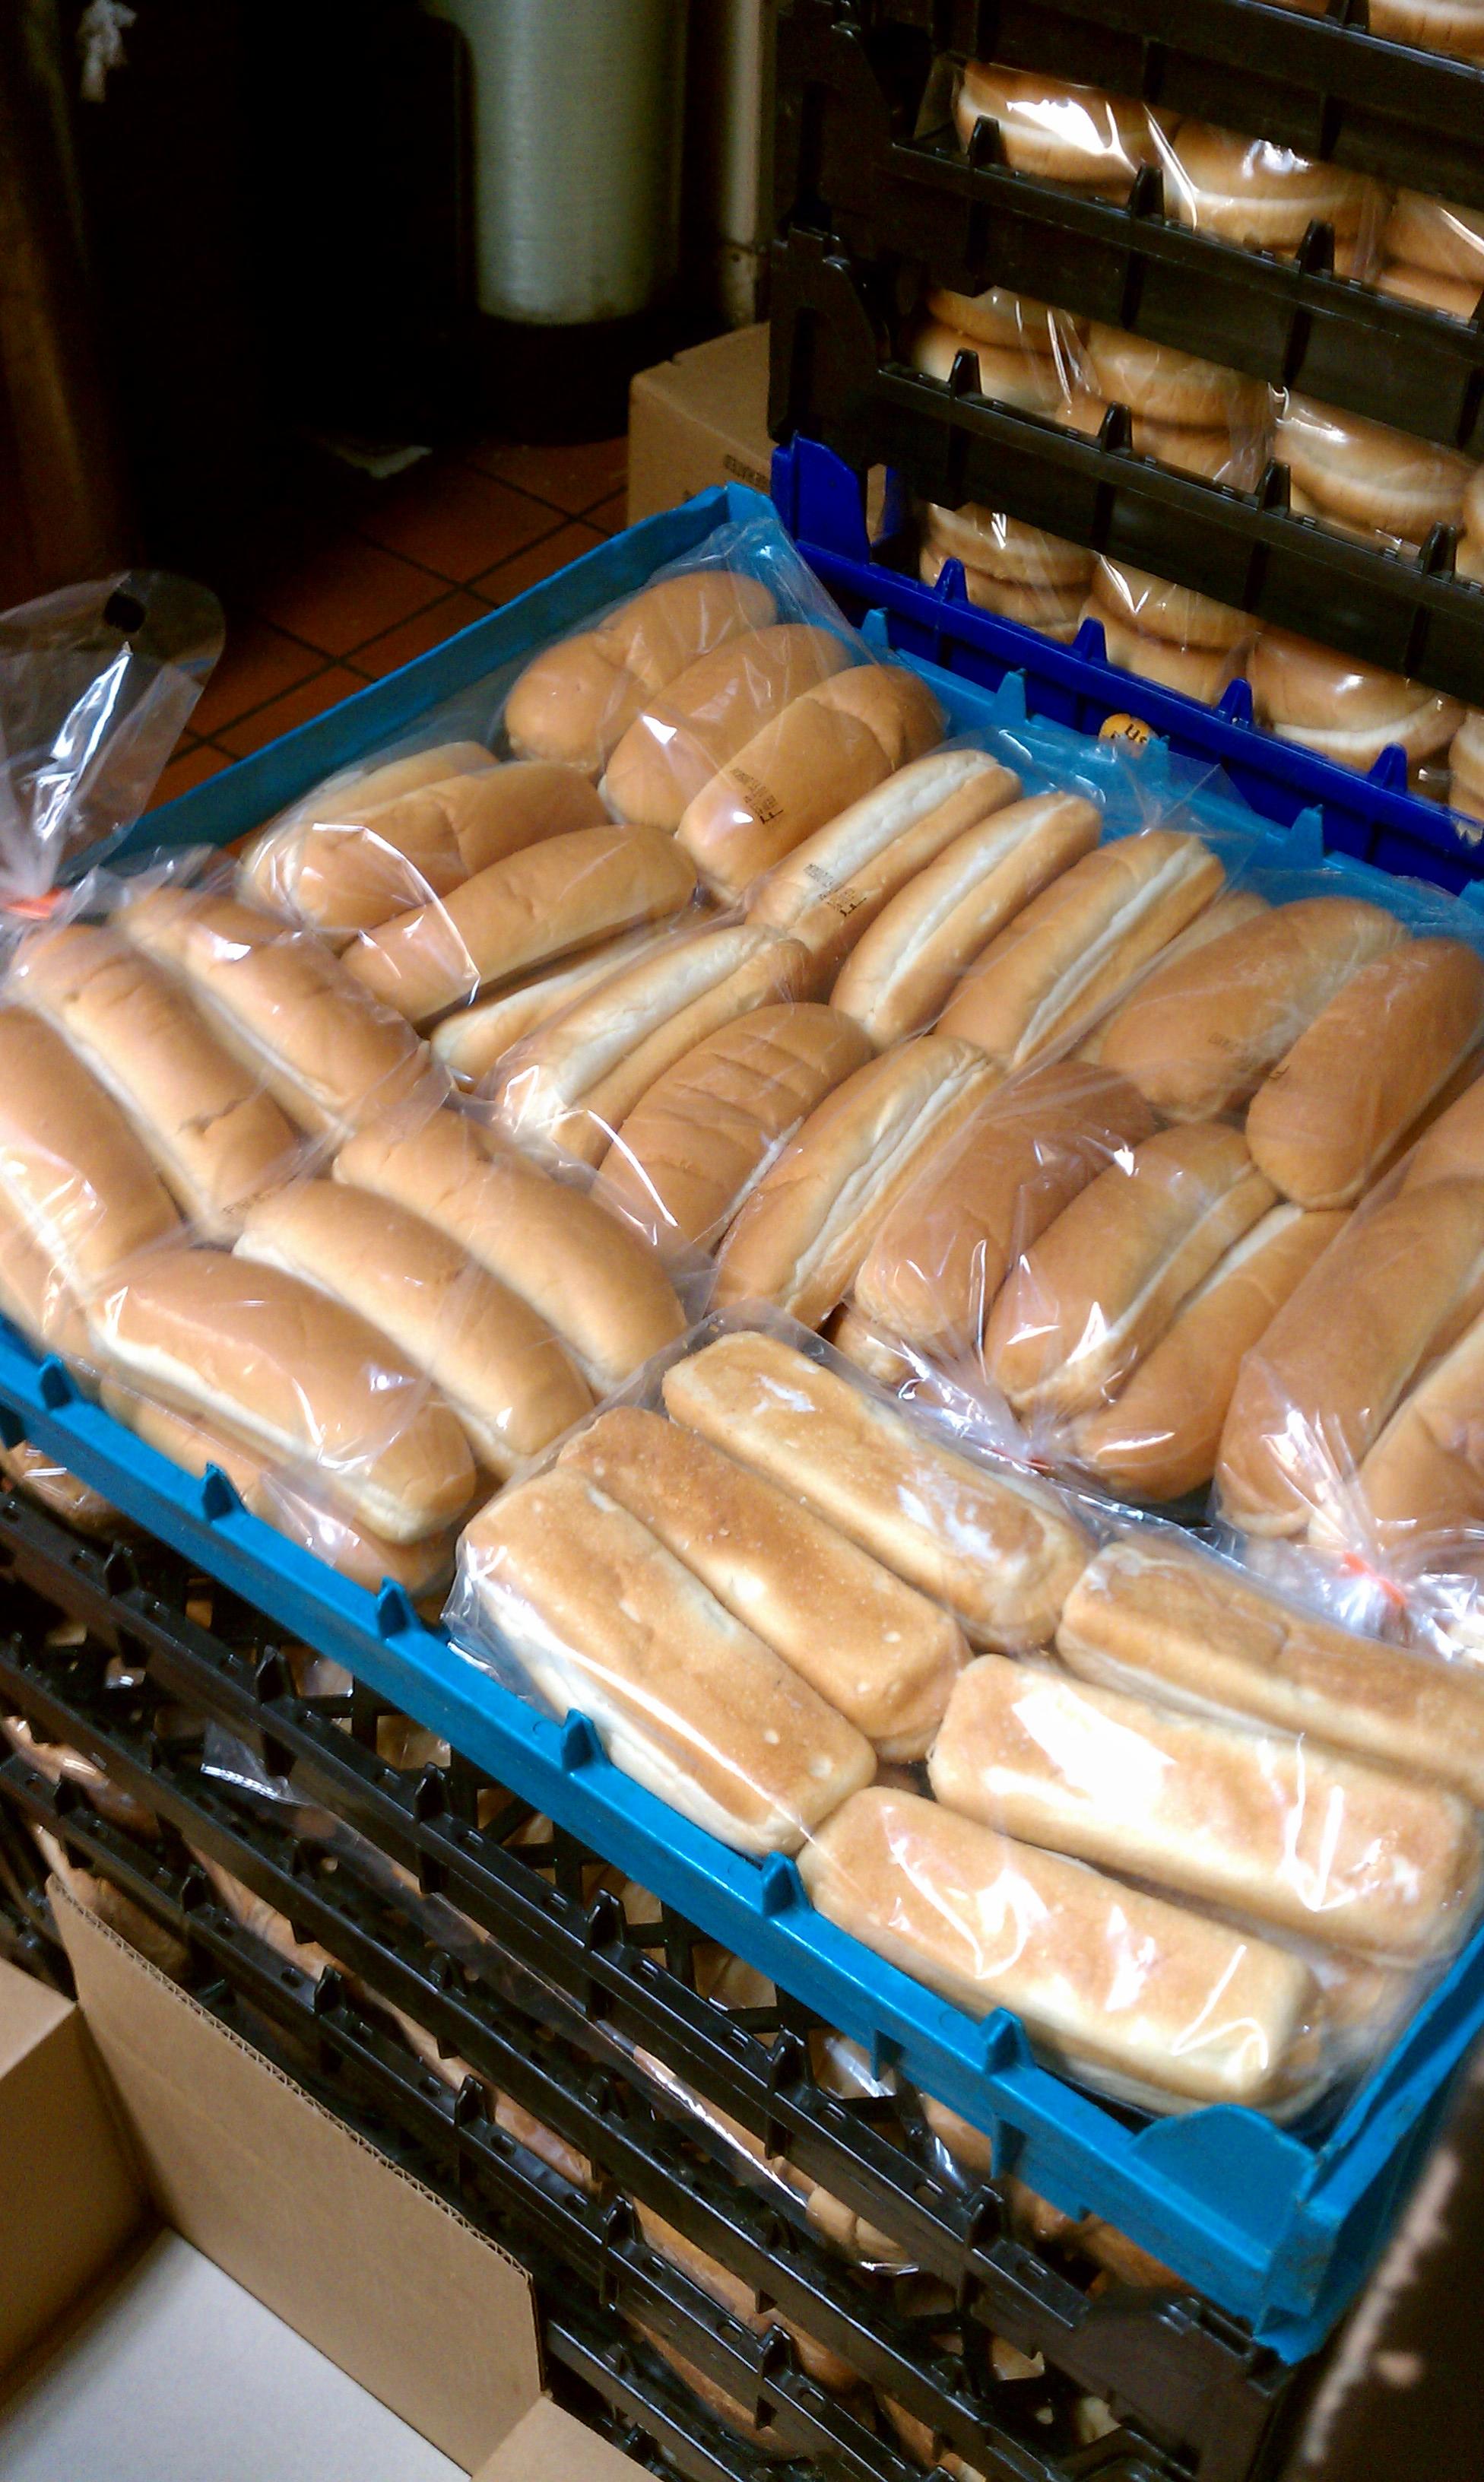 Jib, wa :: Hot dog buns. At jack in the box. Very wrong delivery